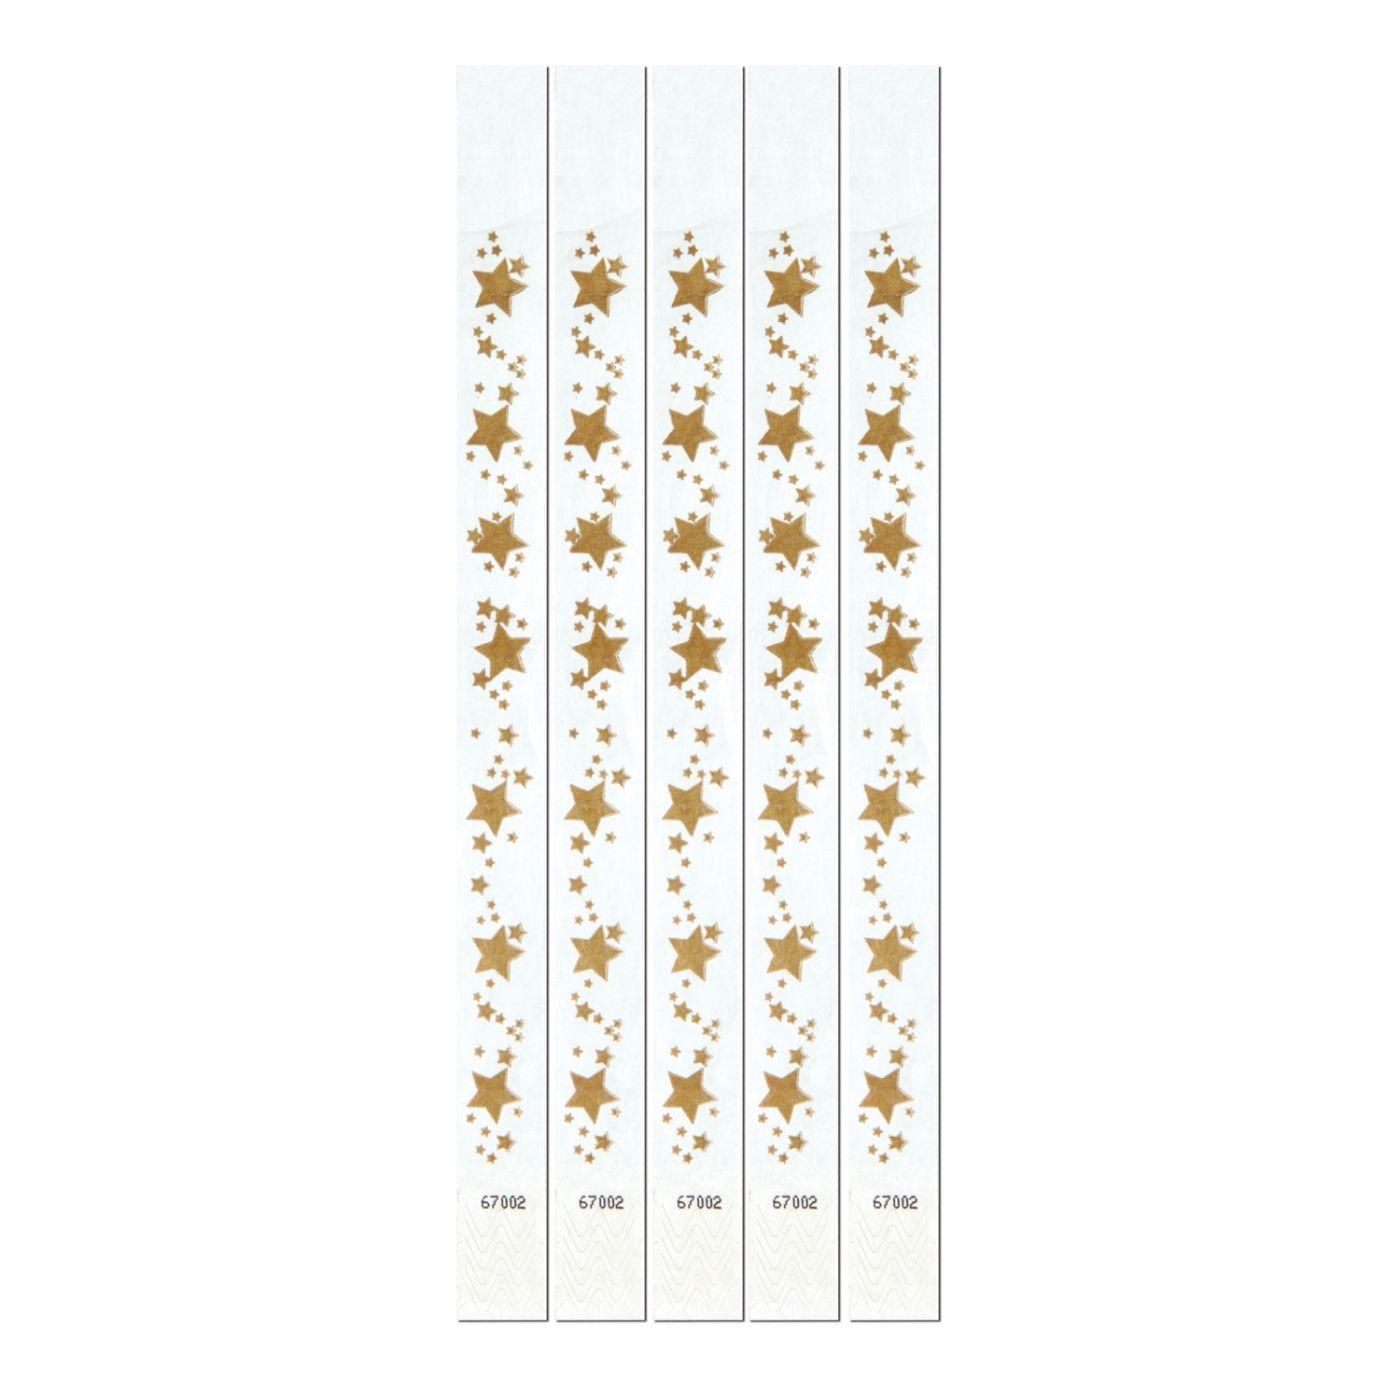 Gold Star Tyvek Wristbands (6) image